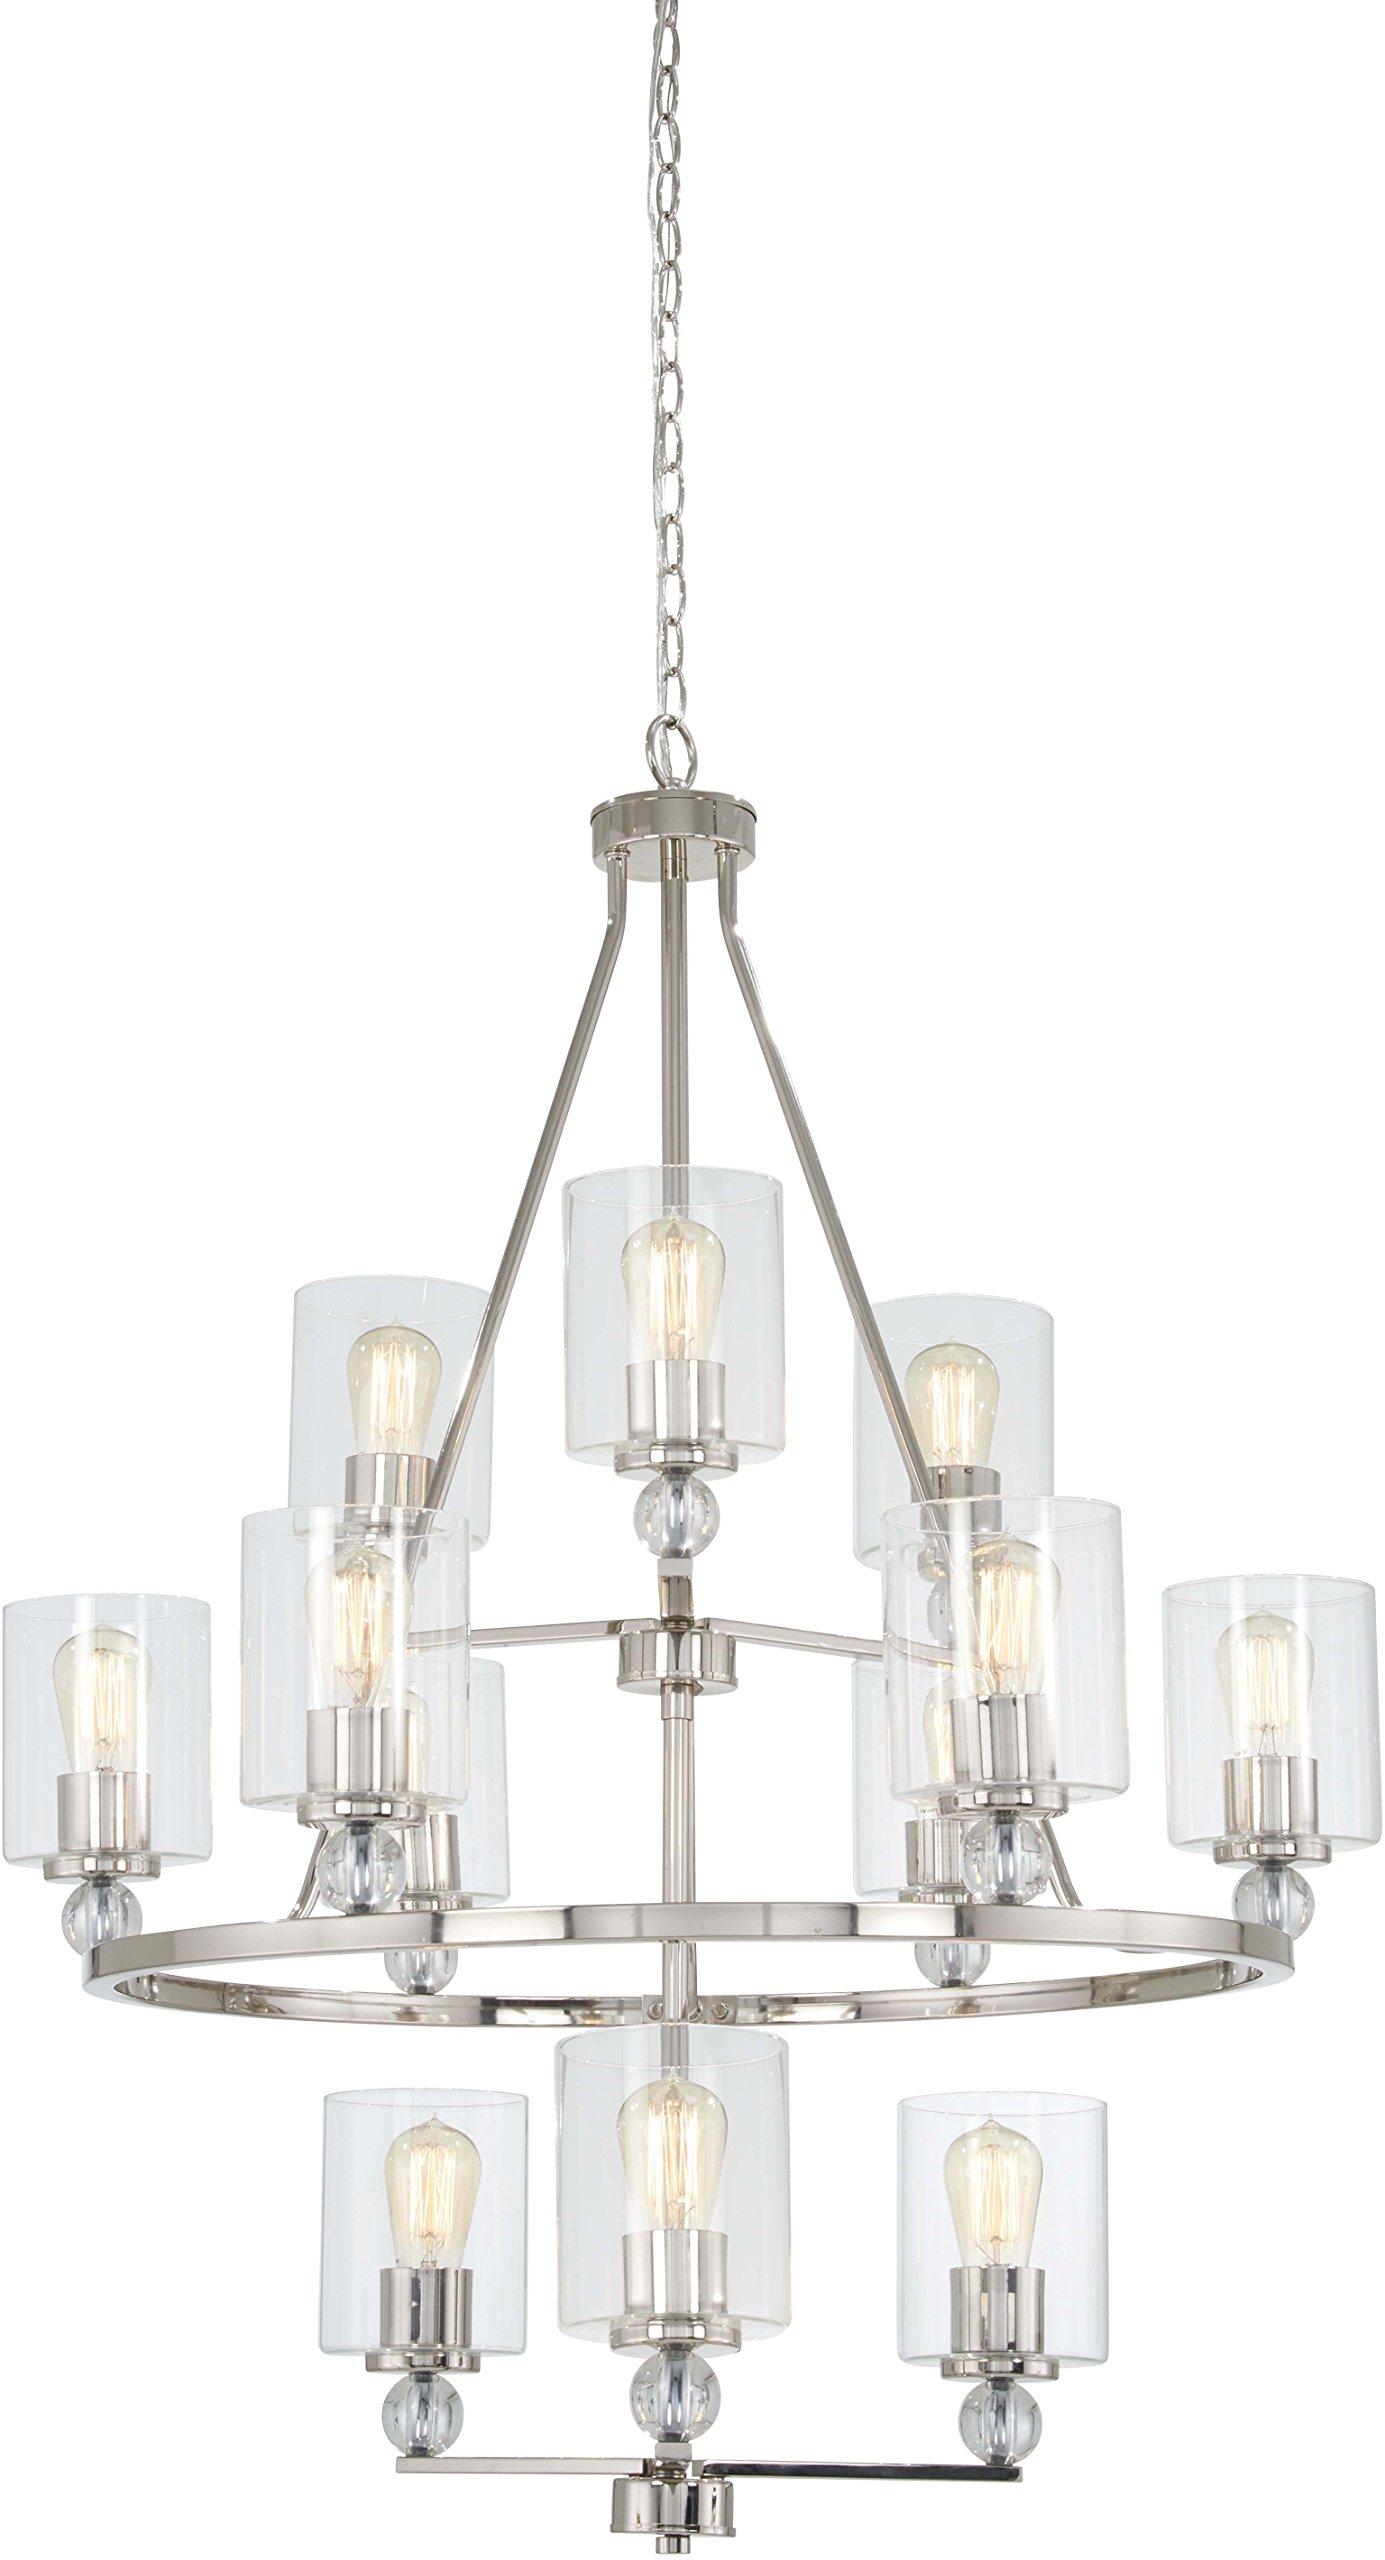 Minka Lavery Chandelier Pendant Lighting 3088-613 Studio 5 Dining Room Fixture, 12-Light 720 Watts, Polished Nickel